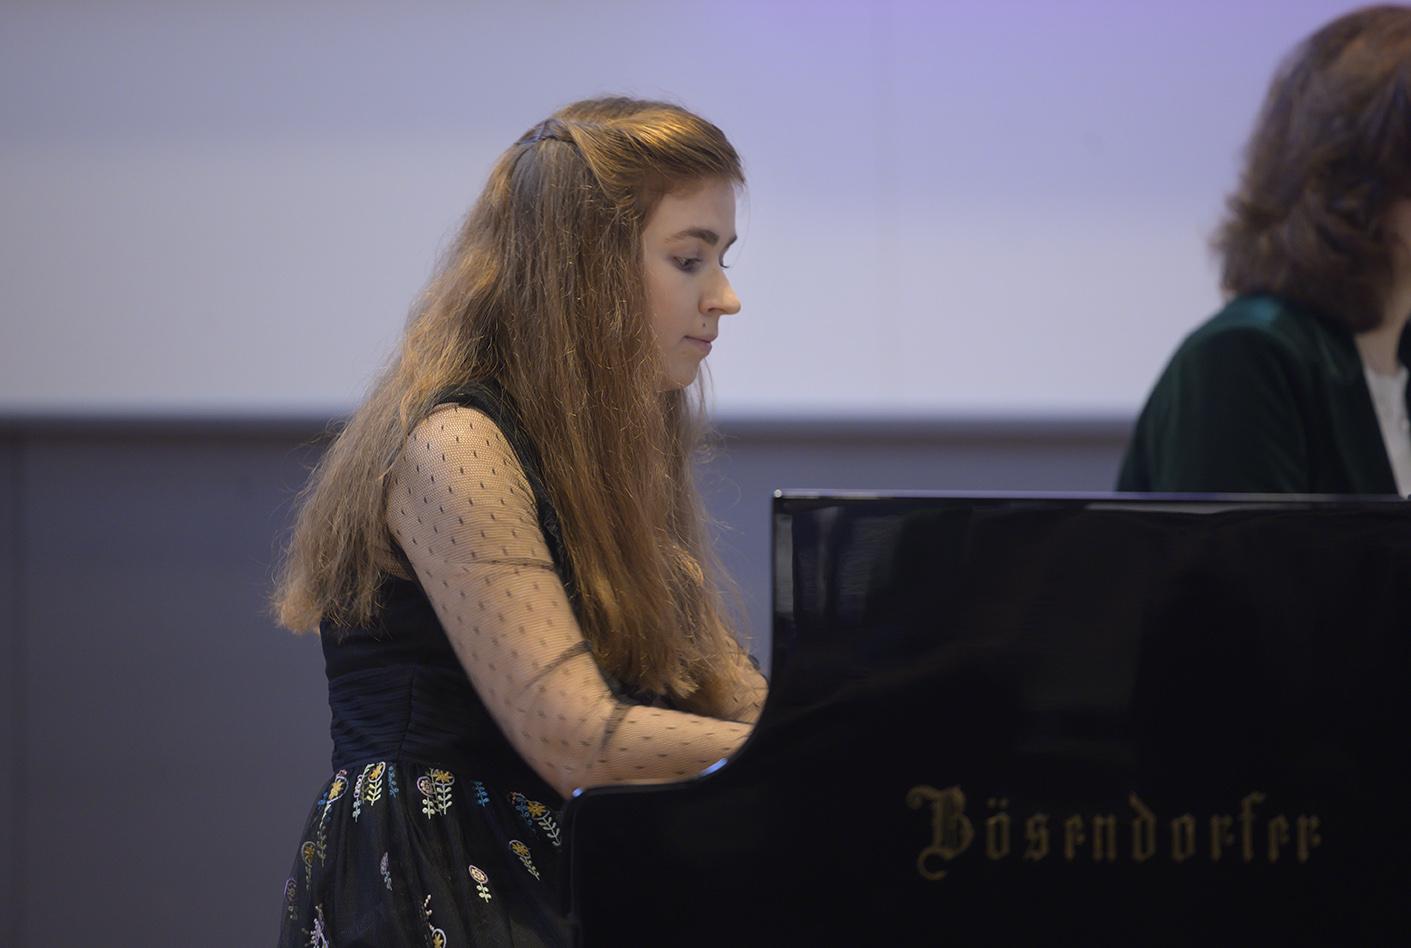 Anna Pismak, Finalist Rahn Musikpreis 2020 for piano